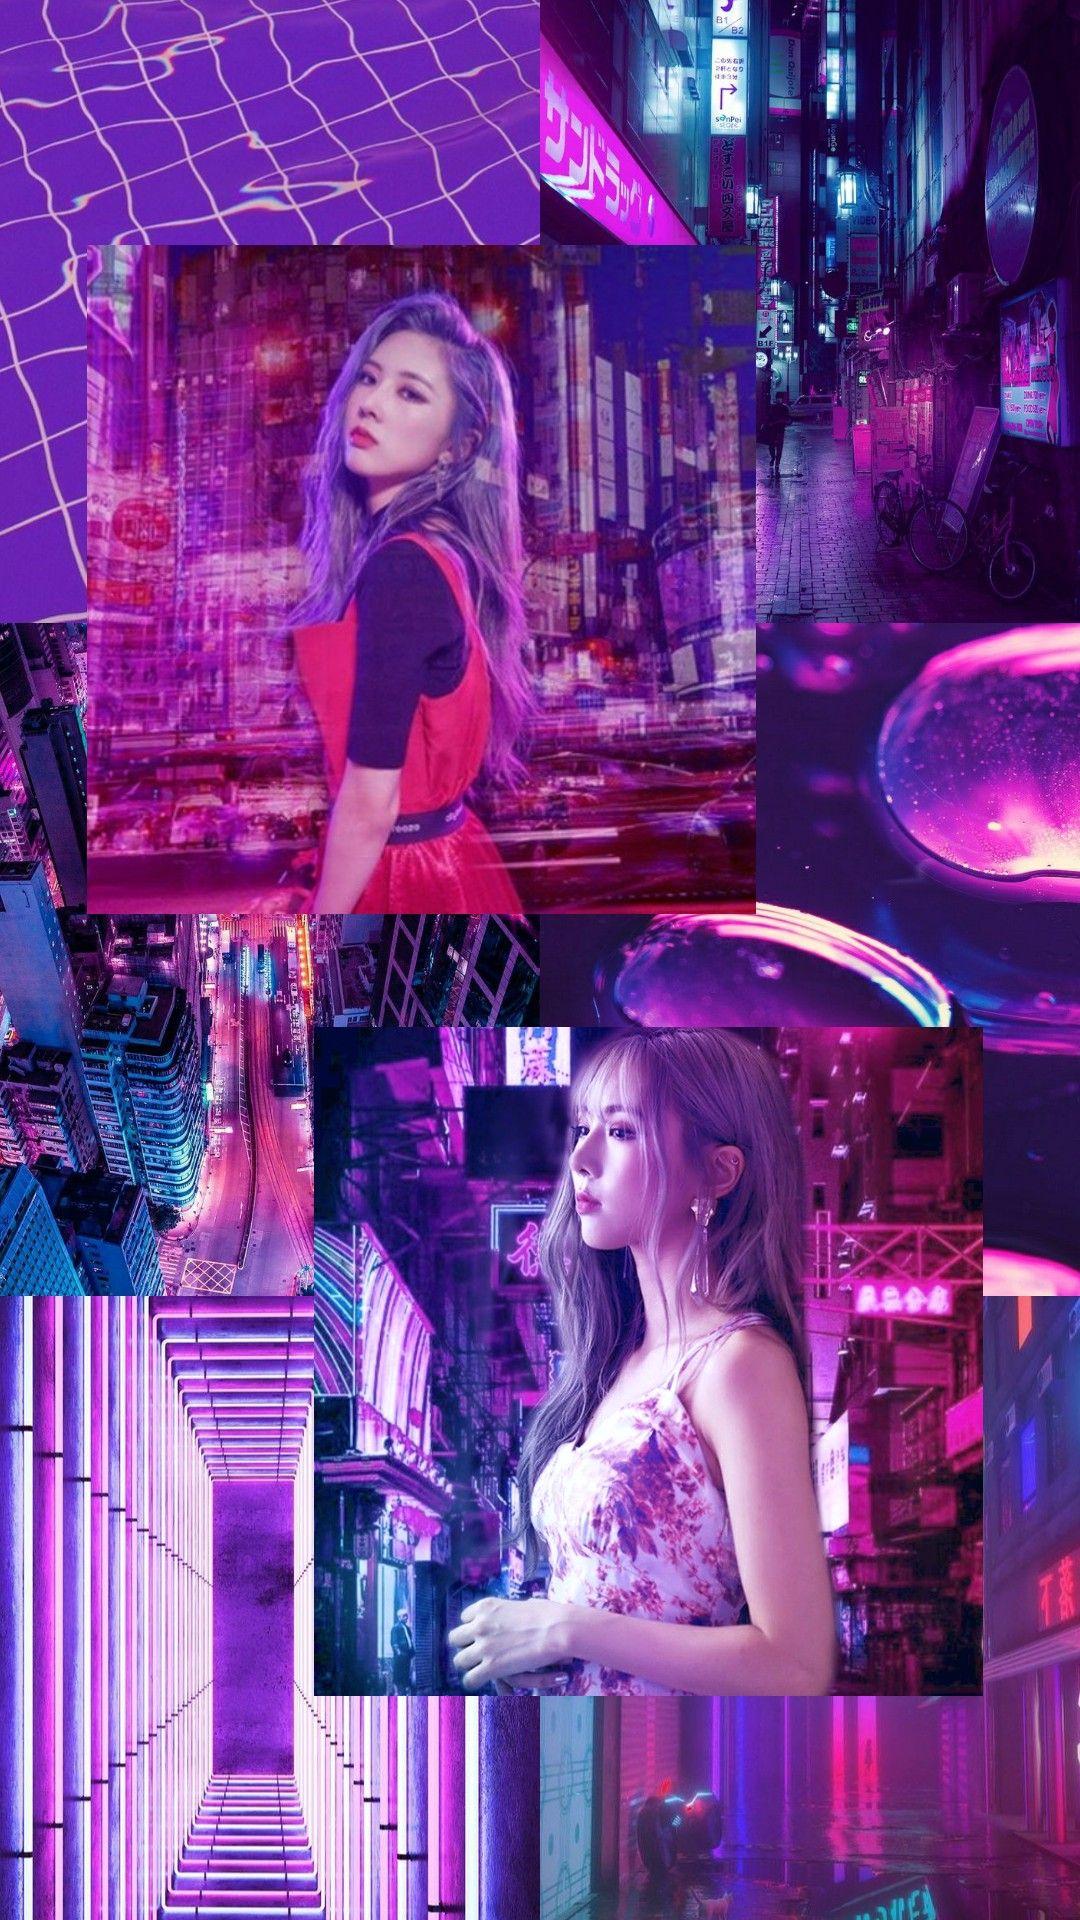 Yoohyeon Dreamcatcher Aesthetic Wallpaper Dreamcatcher Wallpaper Cool Kpop Wallpapers Dream Catcher